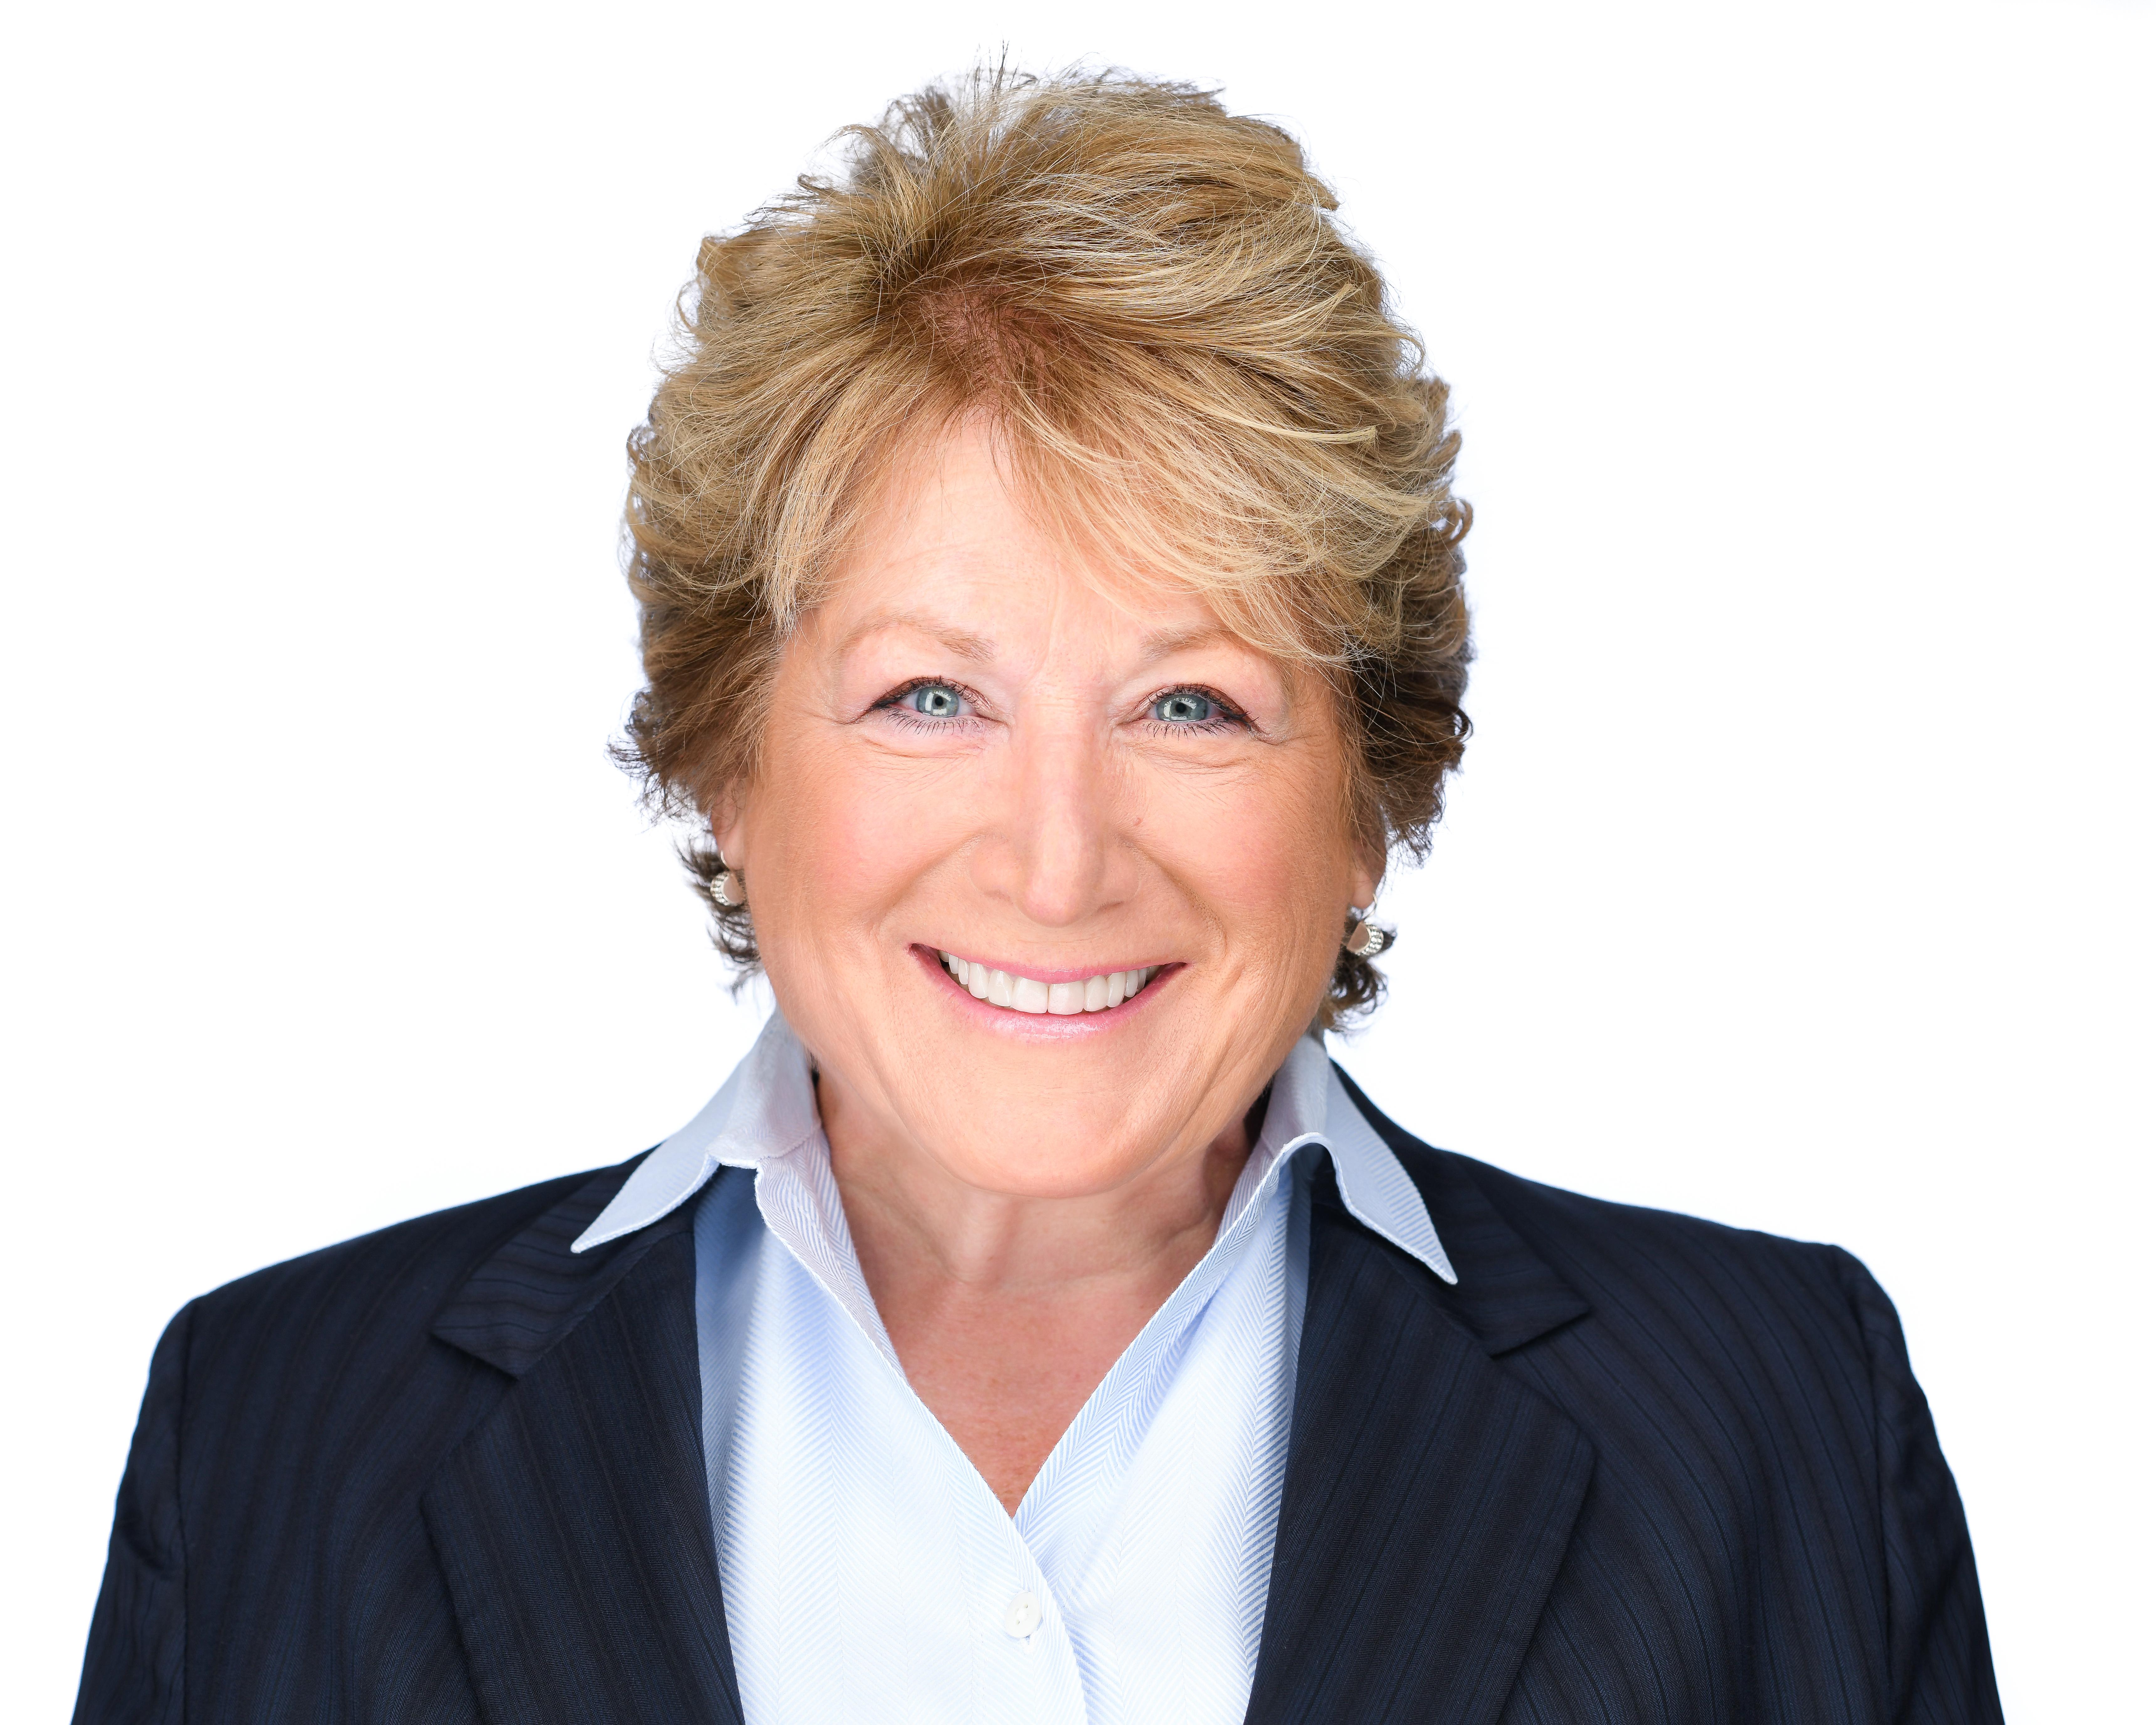 Cintas Appoints Karen L  Carnahan to Board of Directors